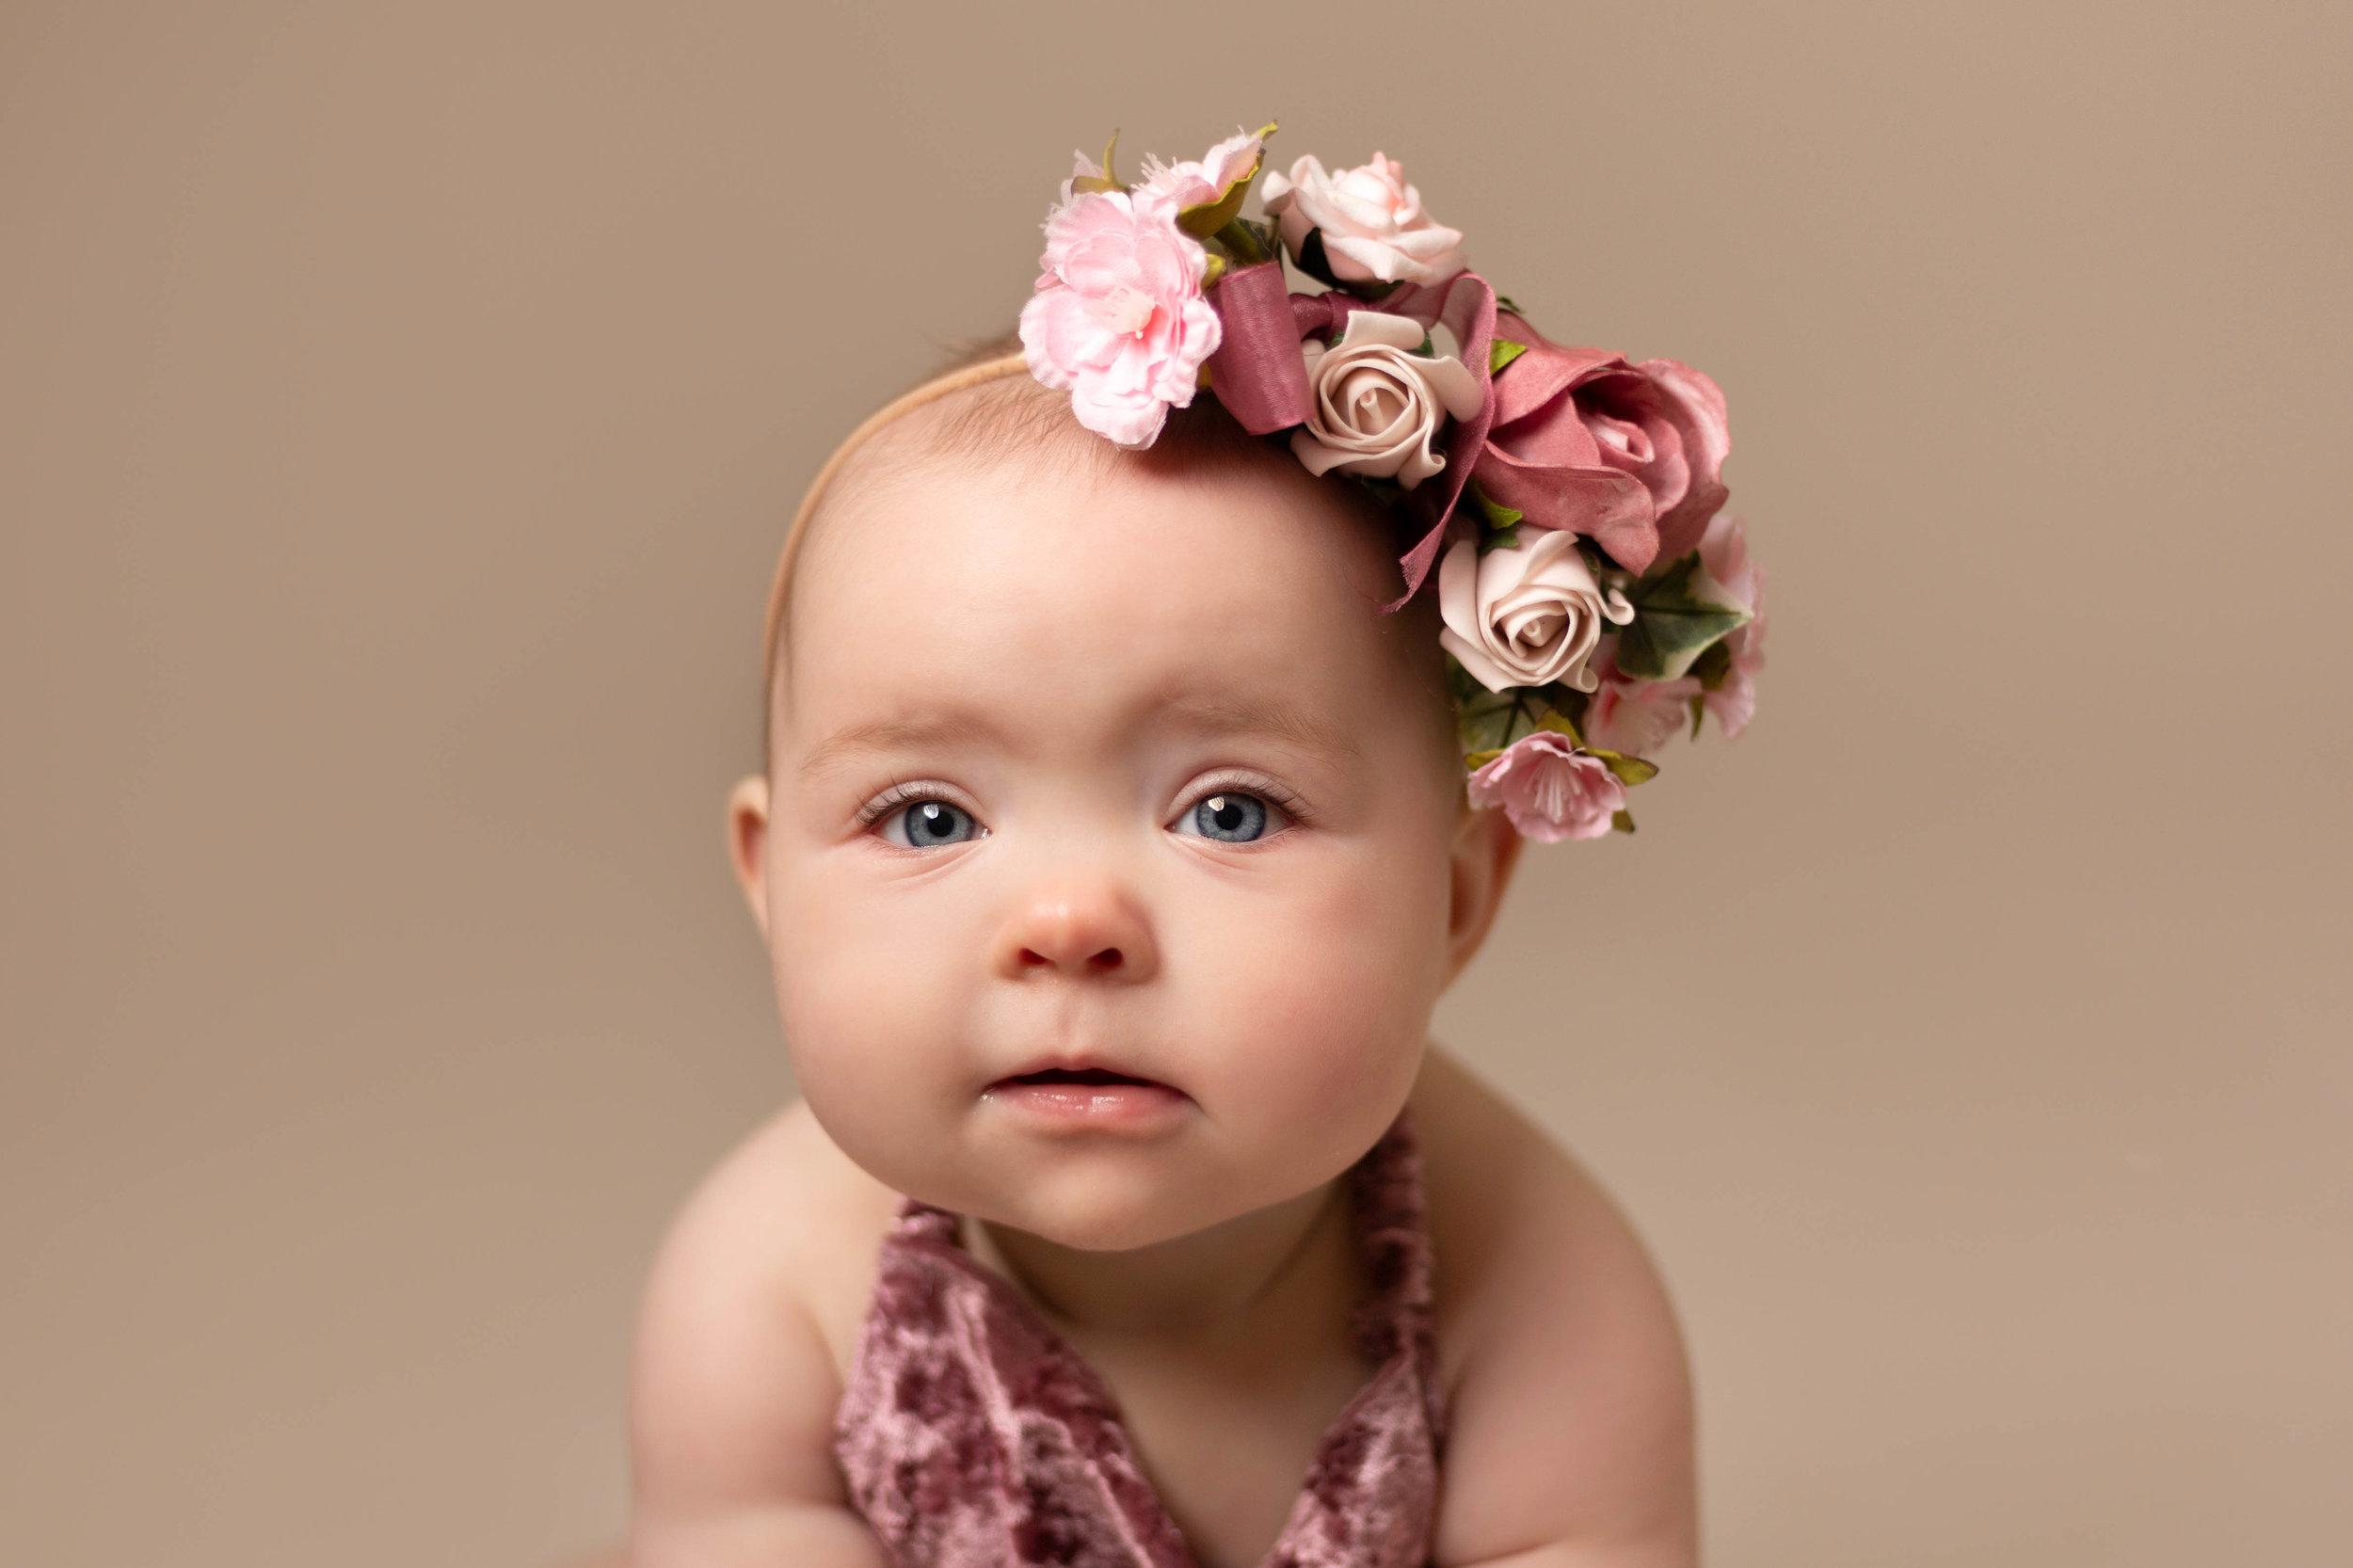 LEA-COOPER-PHOTOGRAPHY-CHILD-PHOTOGRAPHY-WILLENHALL-CHILDREN-PHOTOGRAPHER-WOLVERHAMPTON-BILSTON-WEDNESBURY-KIDS-PHOTOGRAPHER-SITTER-SESSION-MILESTONE--16.JPG